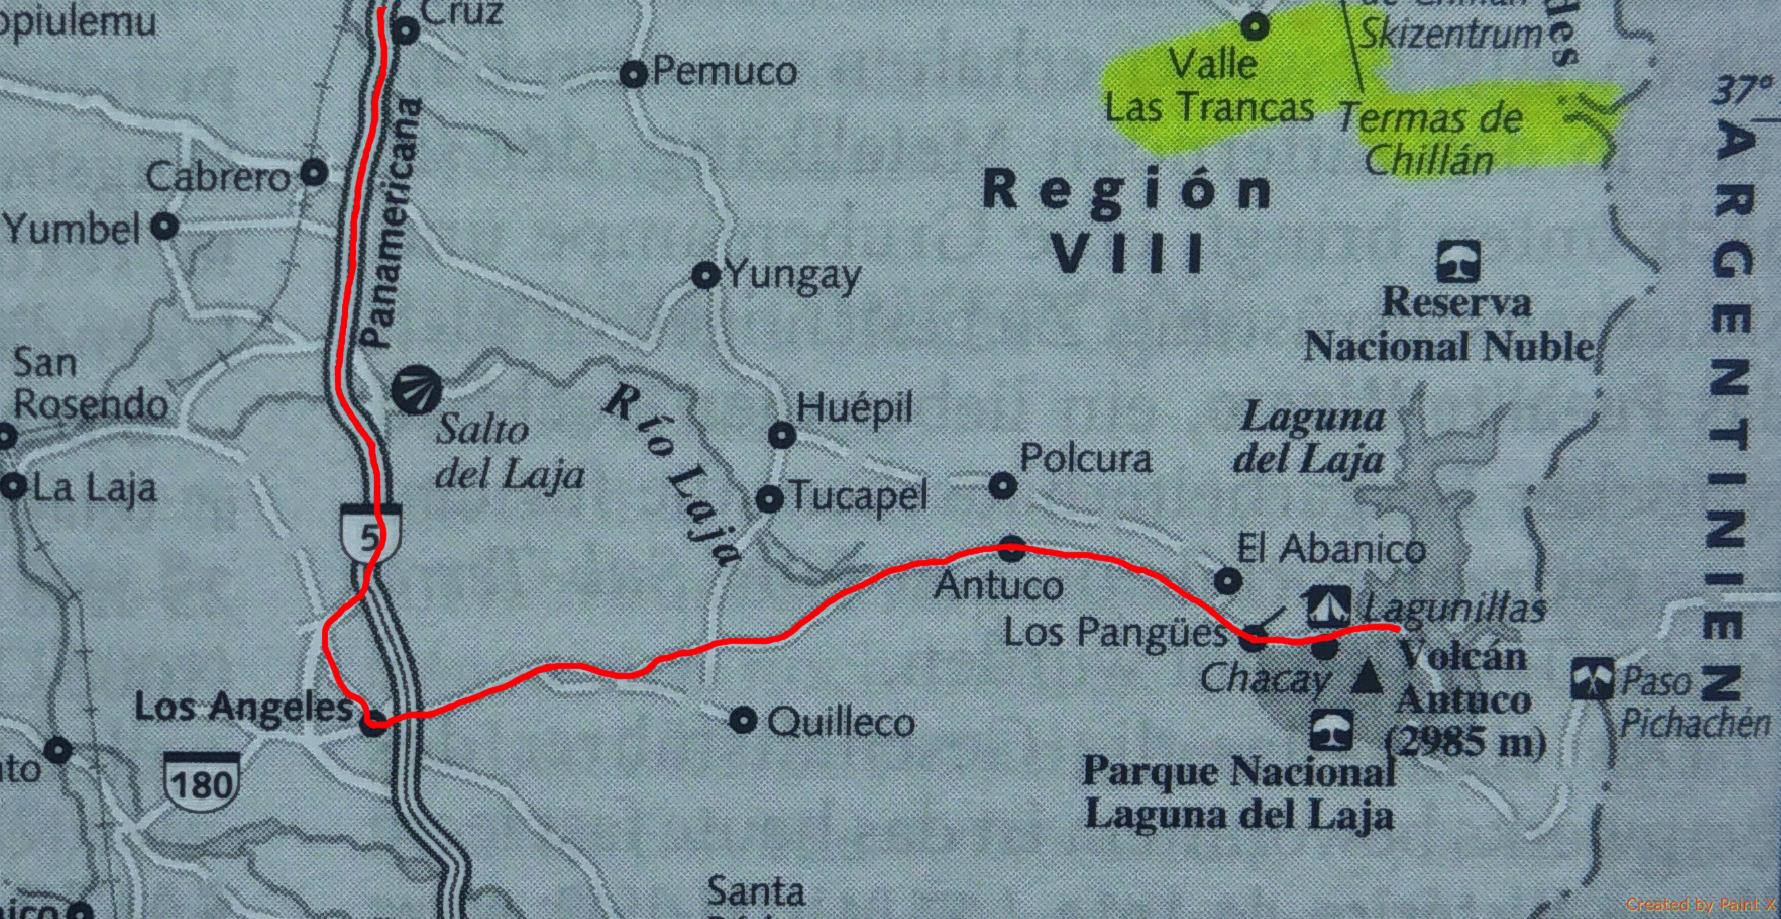 0161 PN Laguna del Laja - Routejpg